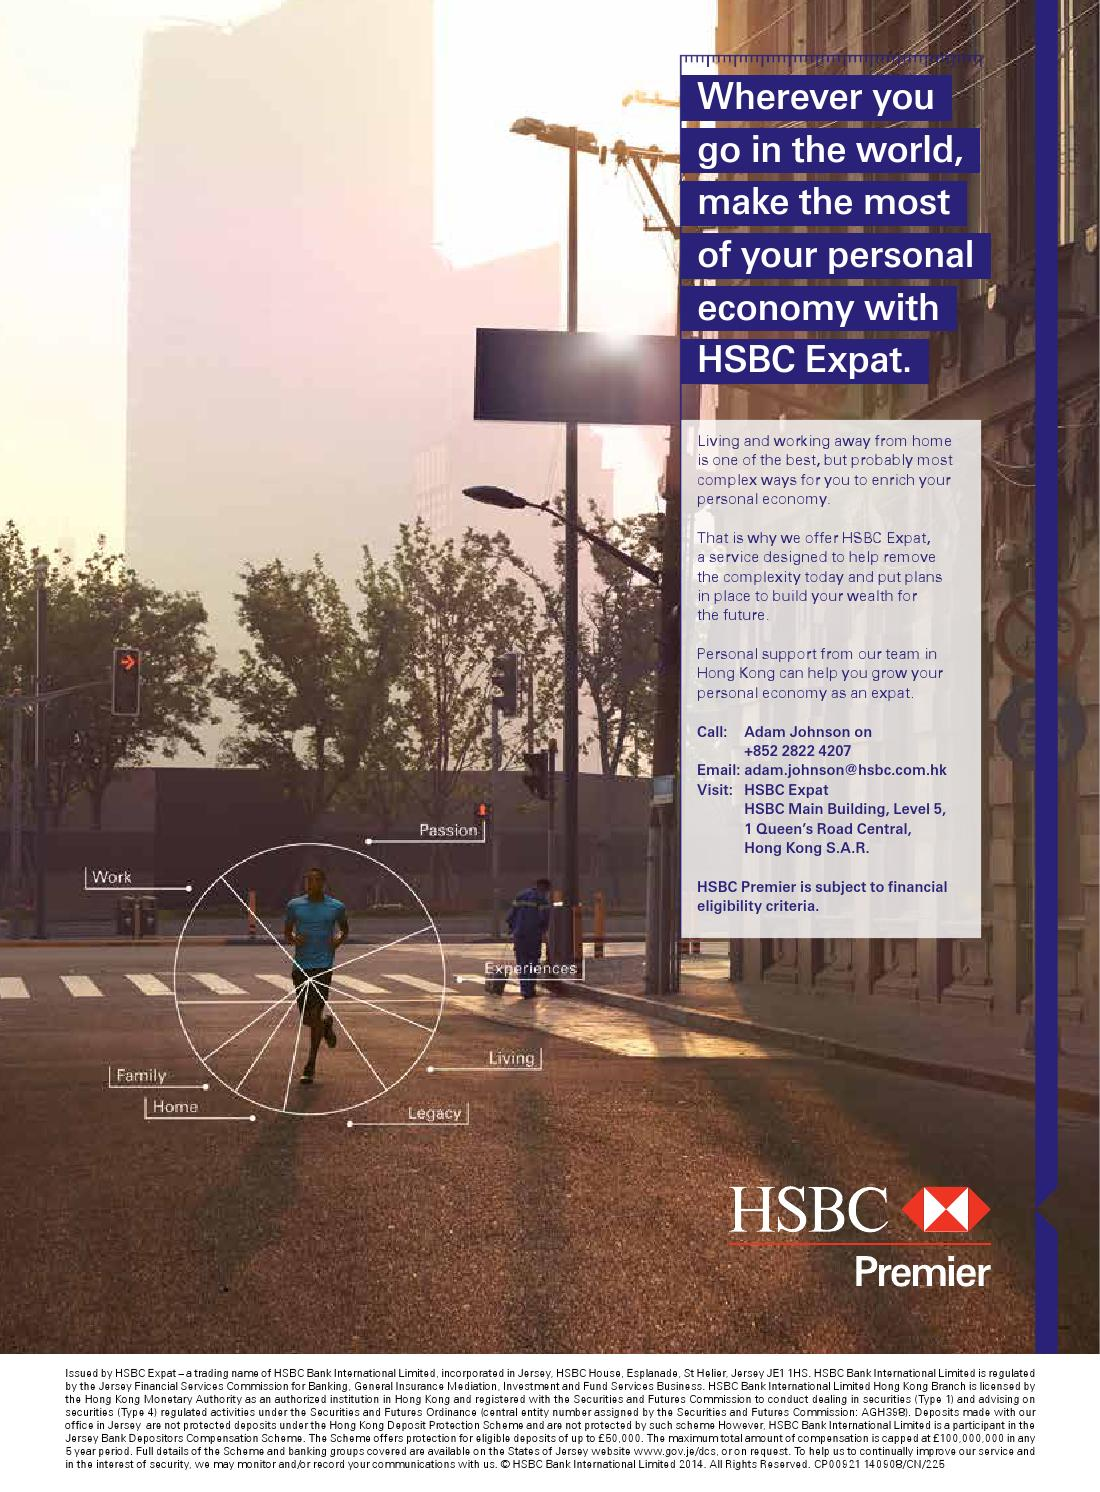 Britain in Hong Kong Dec 2014 - Feb 2015 by The British